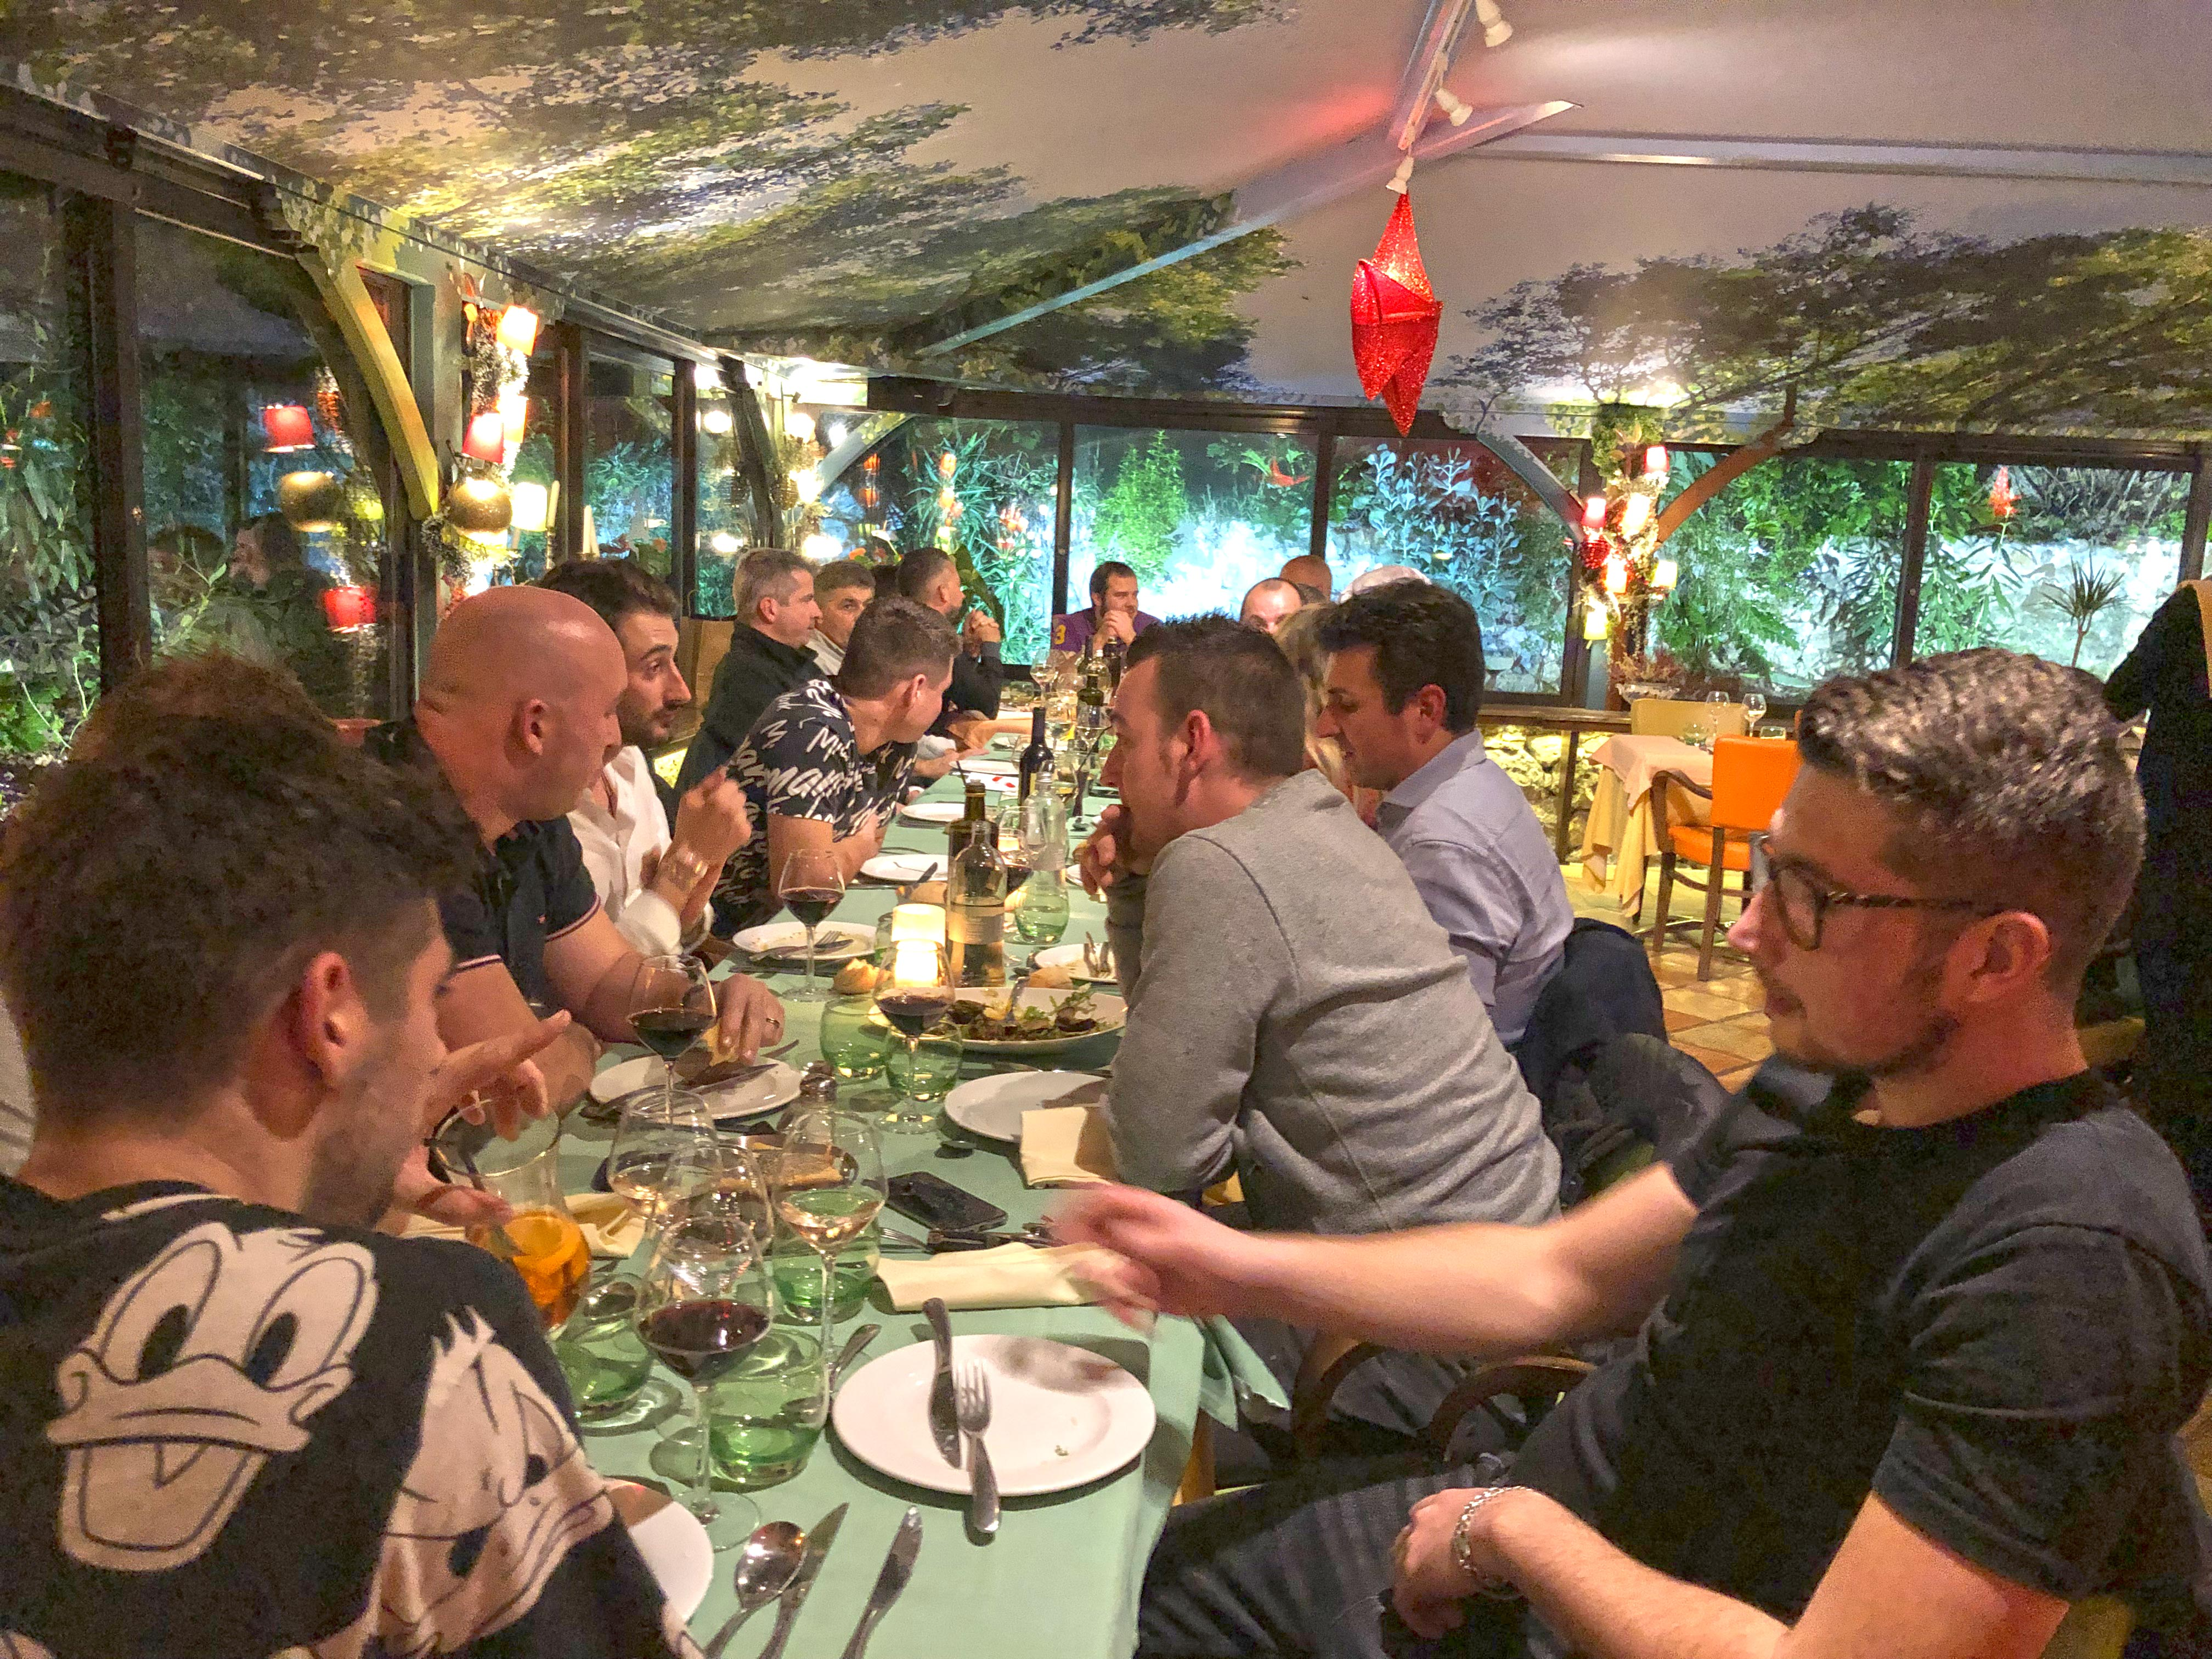 Repas-de-fin-d'année-interne-aucop-nice-marseille-noel-audiovisuel-event-evenement-evenementiel-communication-equipe-team